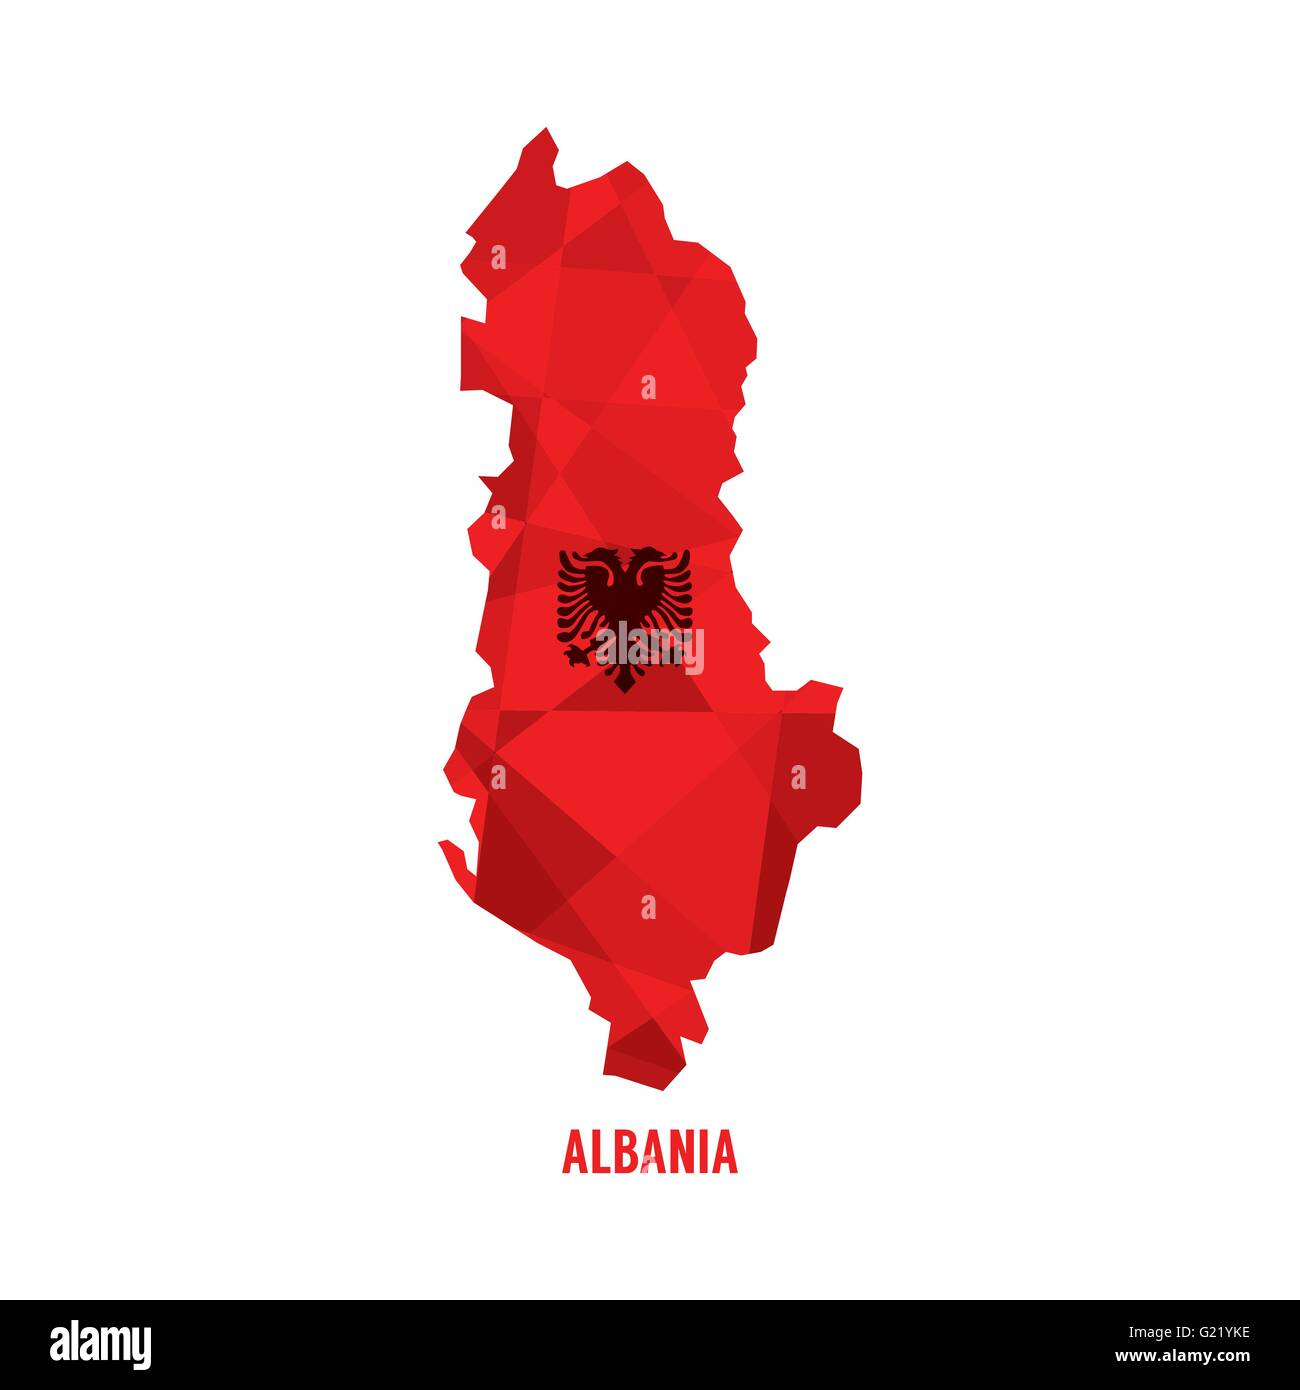 Map of Albania Vector Illustration - Stock Vector